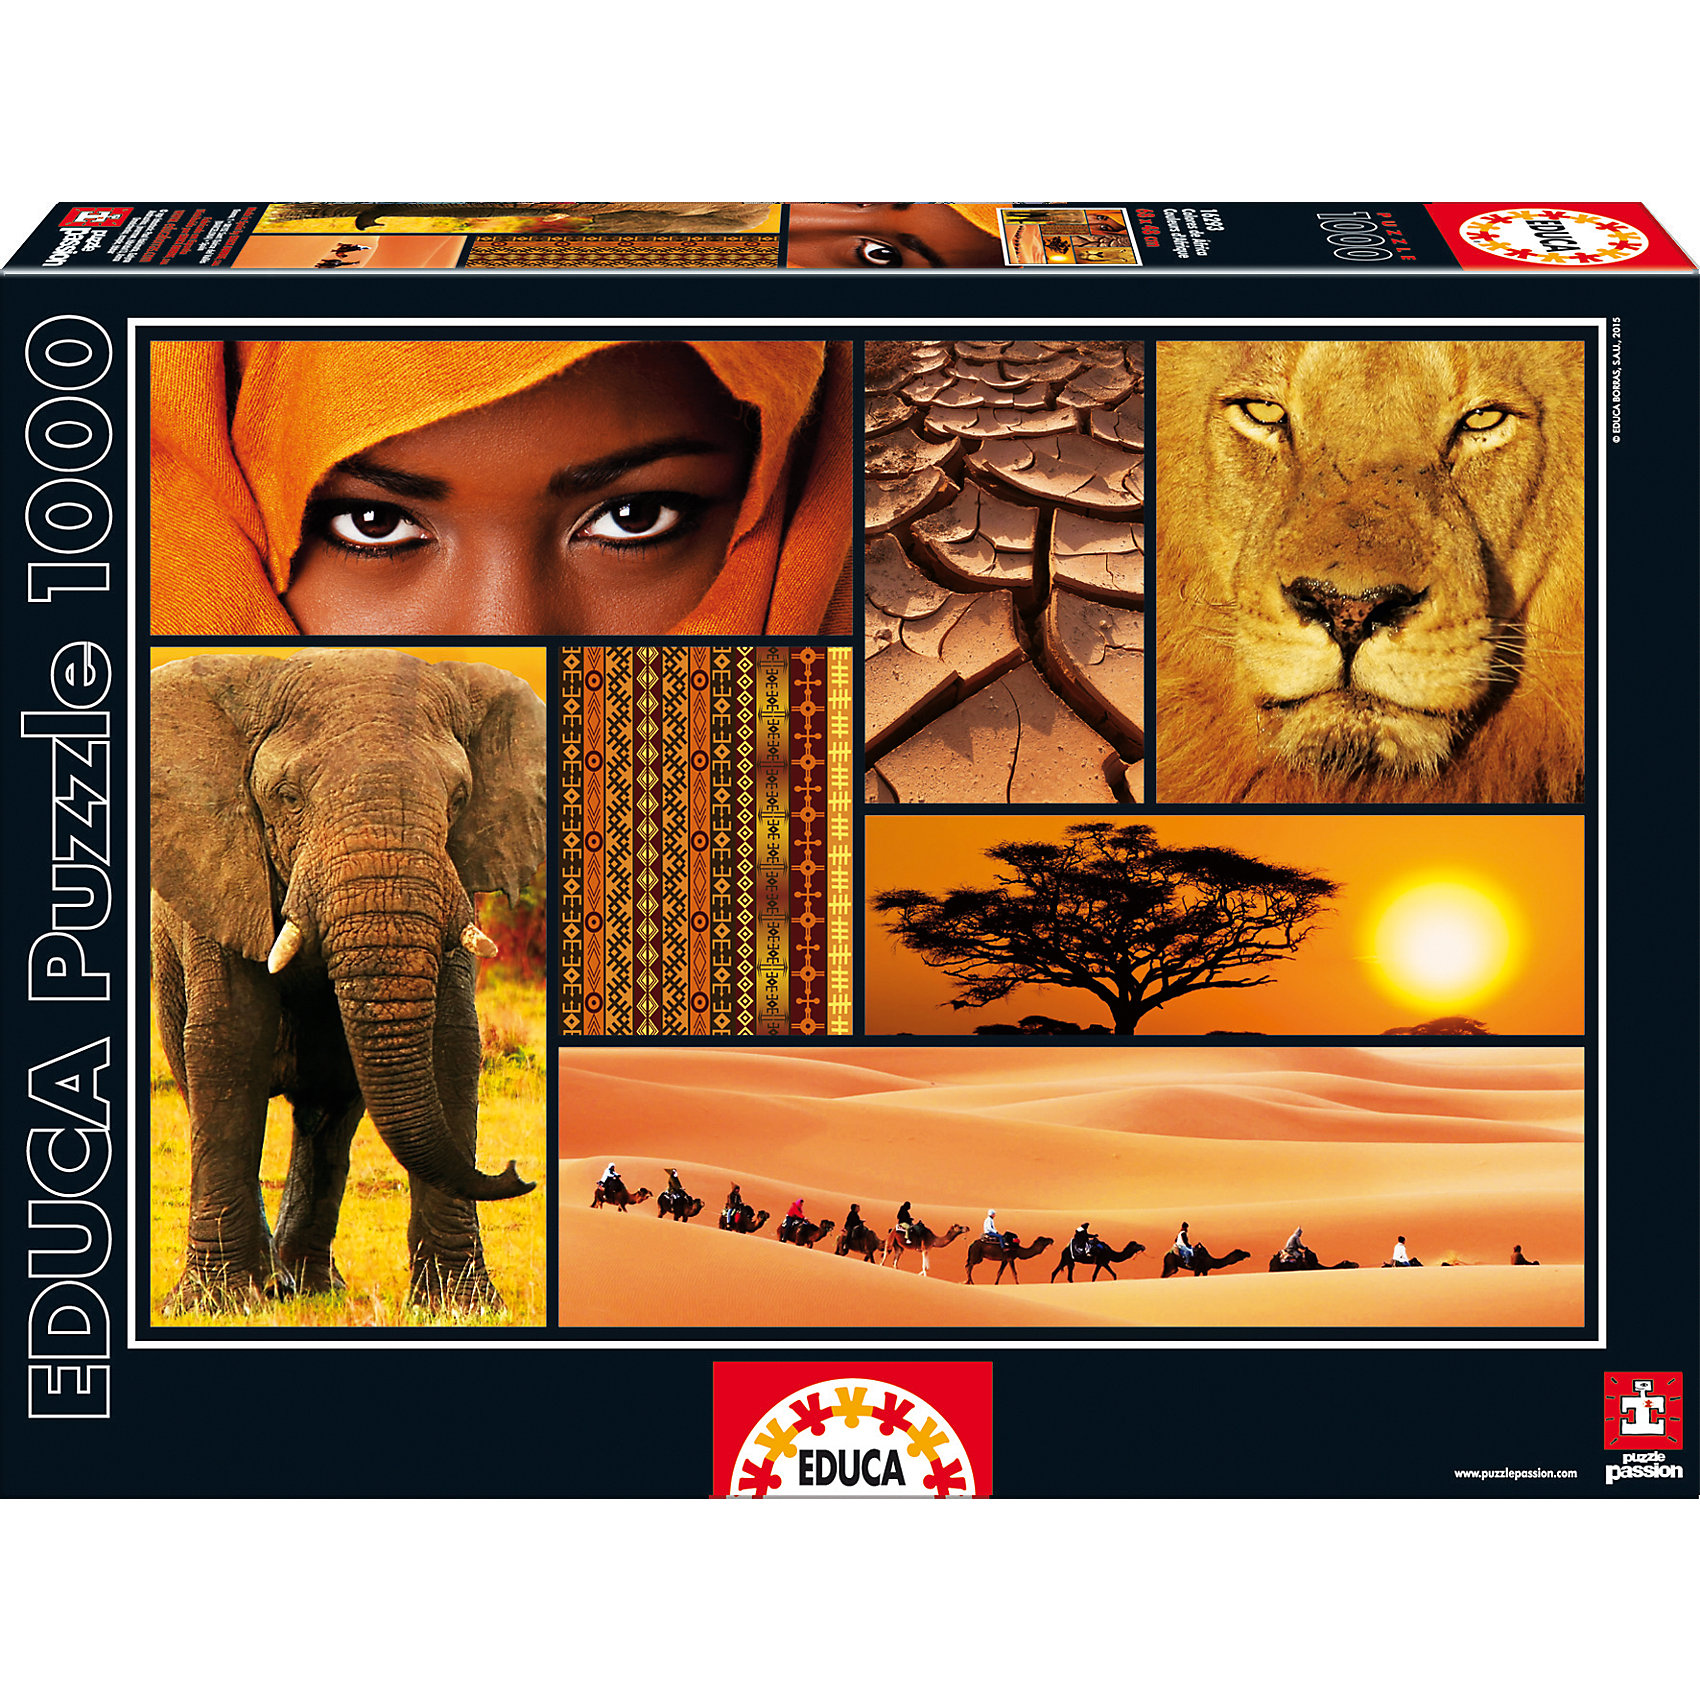 Пазл Мир Африки, 1000 деталей, EducaКлассические пазлы<br><br><br>Ширина мм: 317<br>Глубина мм: 270<br>Высота мм: 55<br>Вес г: 768<br>Возраст от месяцев: 60<br>Возраст до месяцев: 2147483647<br>Пол: Унисекс<br>Возраст: Детский<br>SKU: 5514311